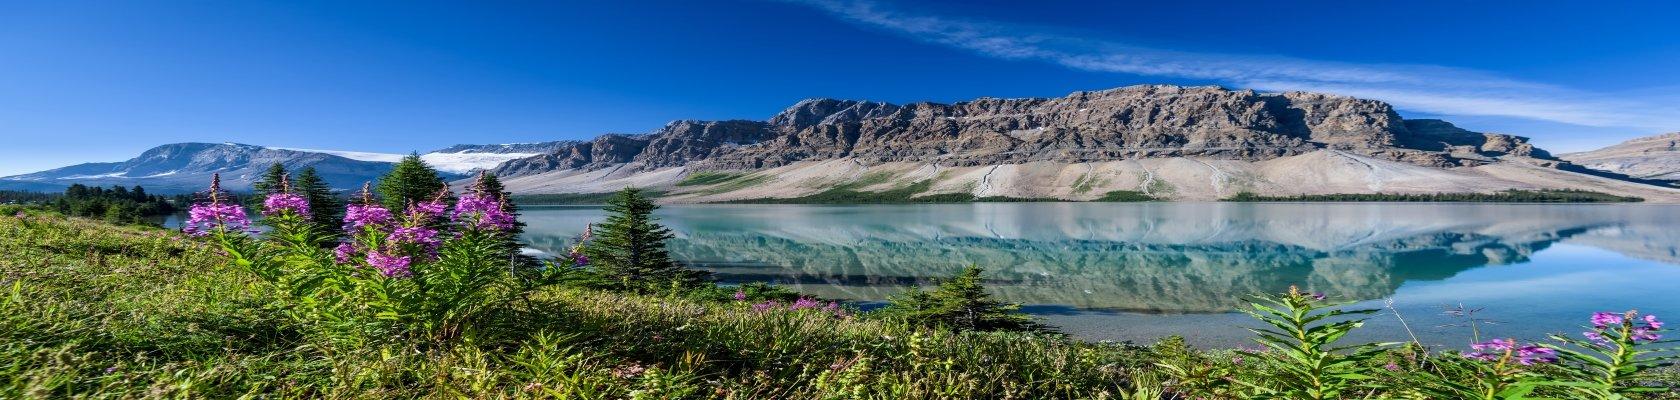 Banff, Rocky Mountain